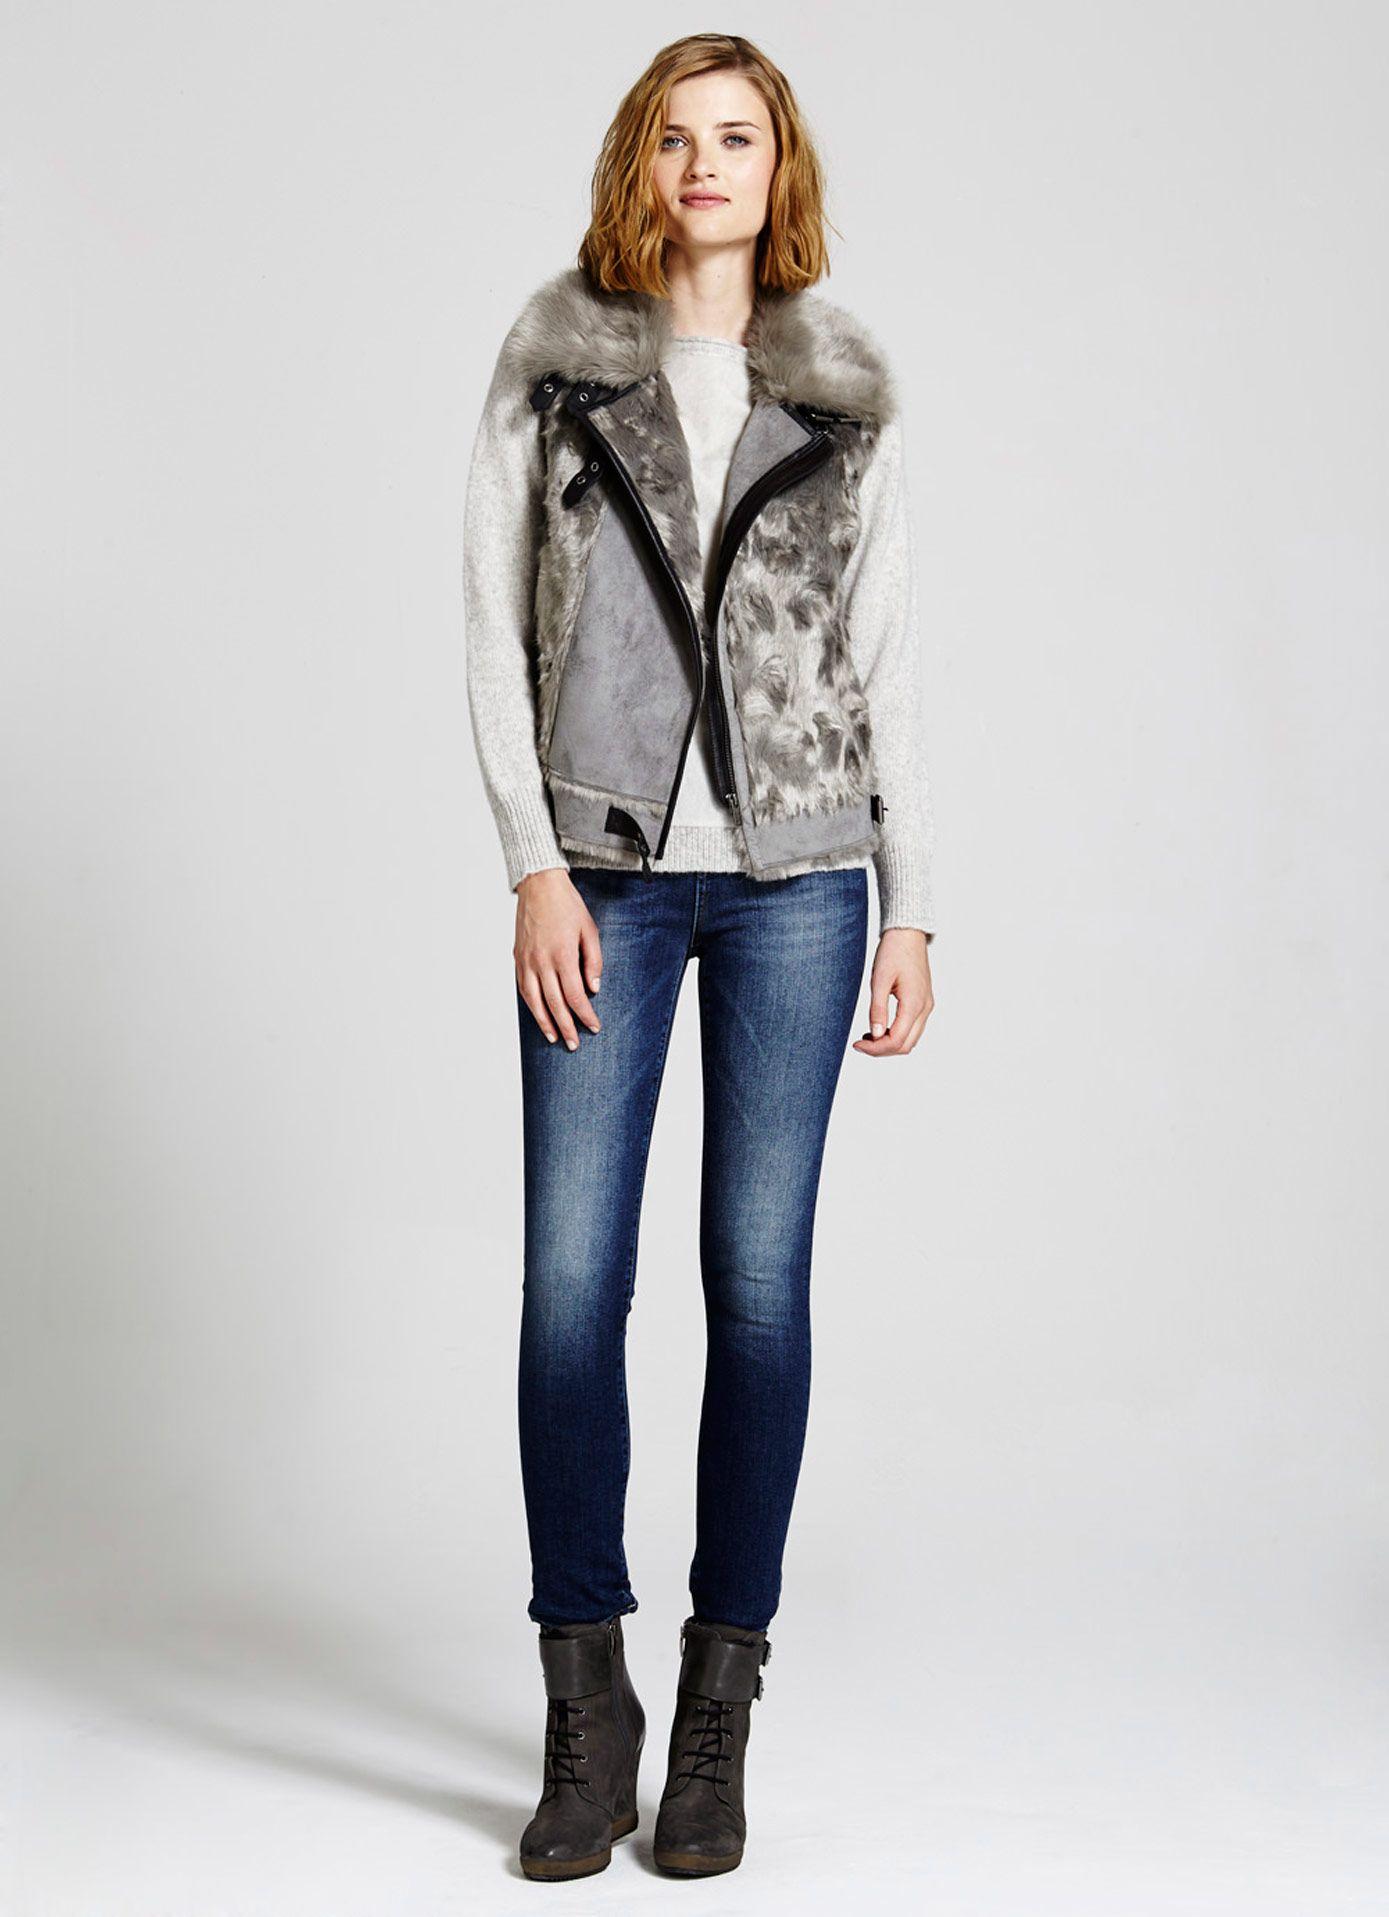 Grey Teddy Mixed Gilet Gilets MintVelvet Clothes for